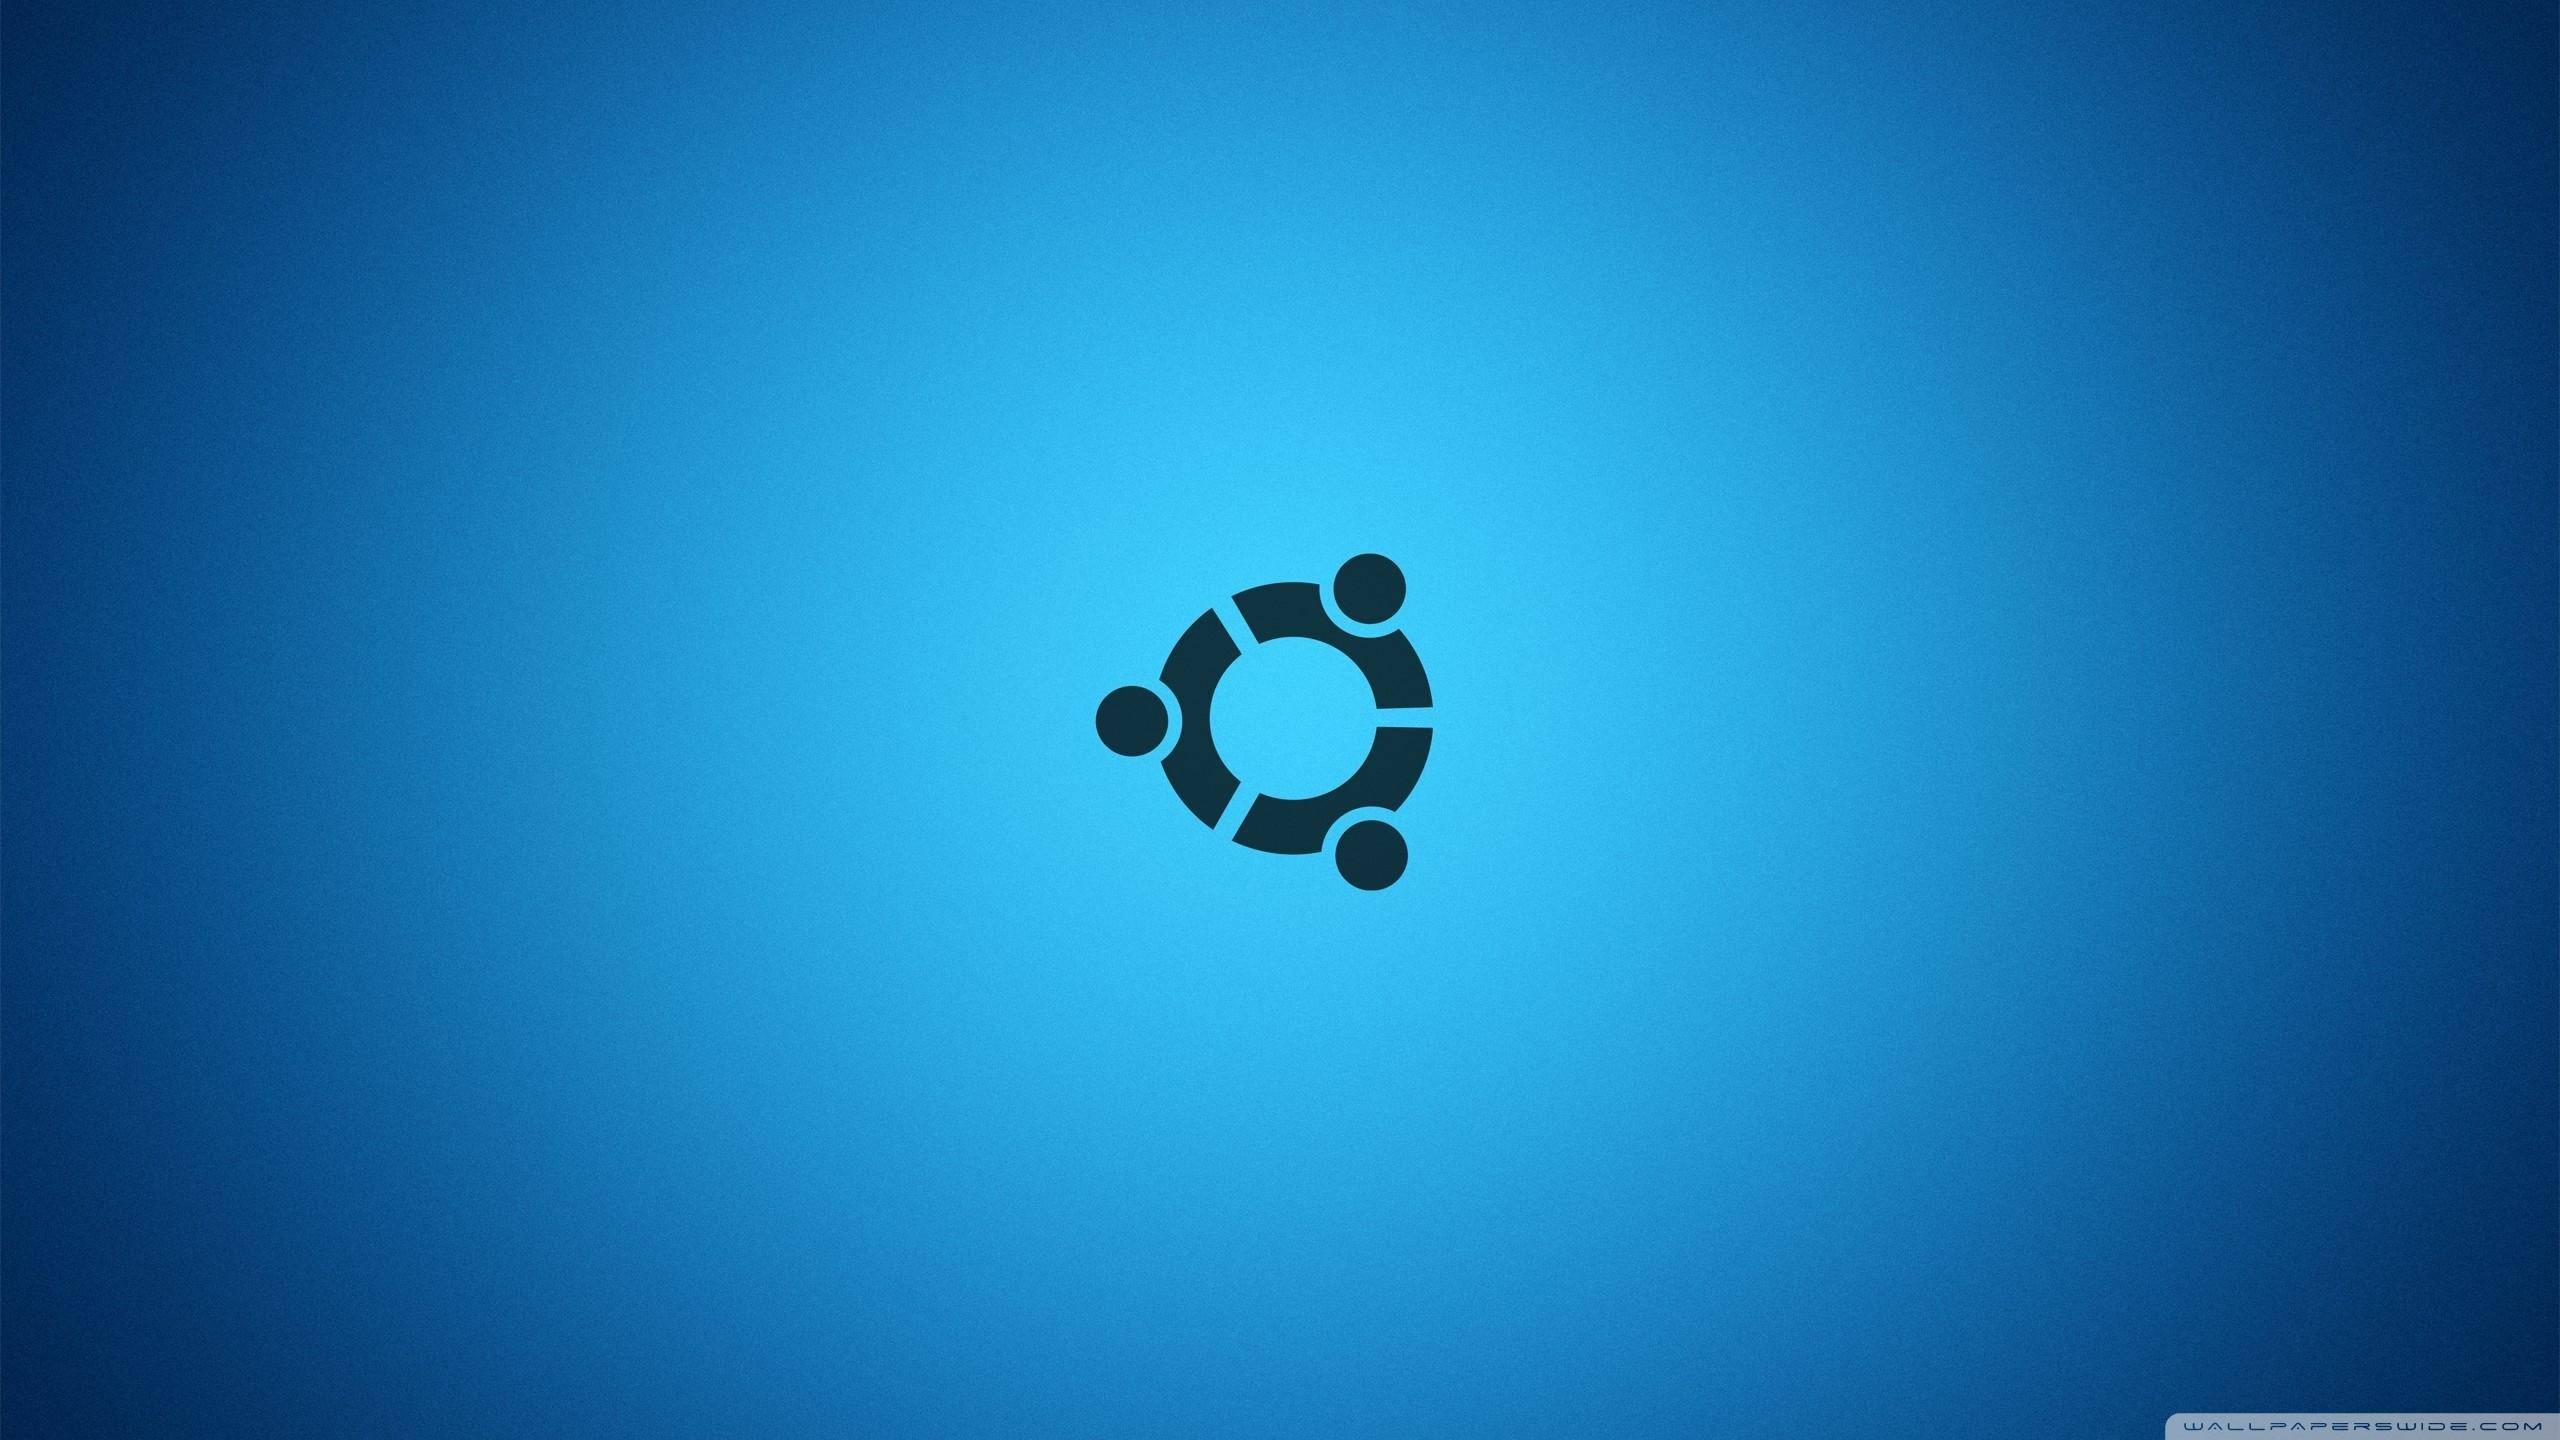 Ubuntu Desktop Blue HD Wide Wallpaper for Widescreen